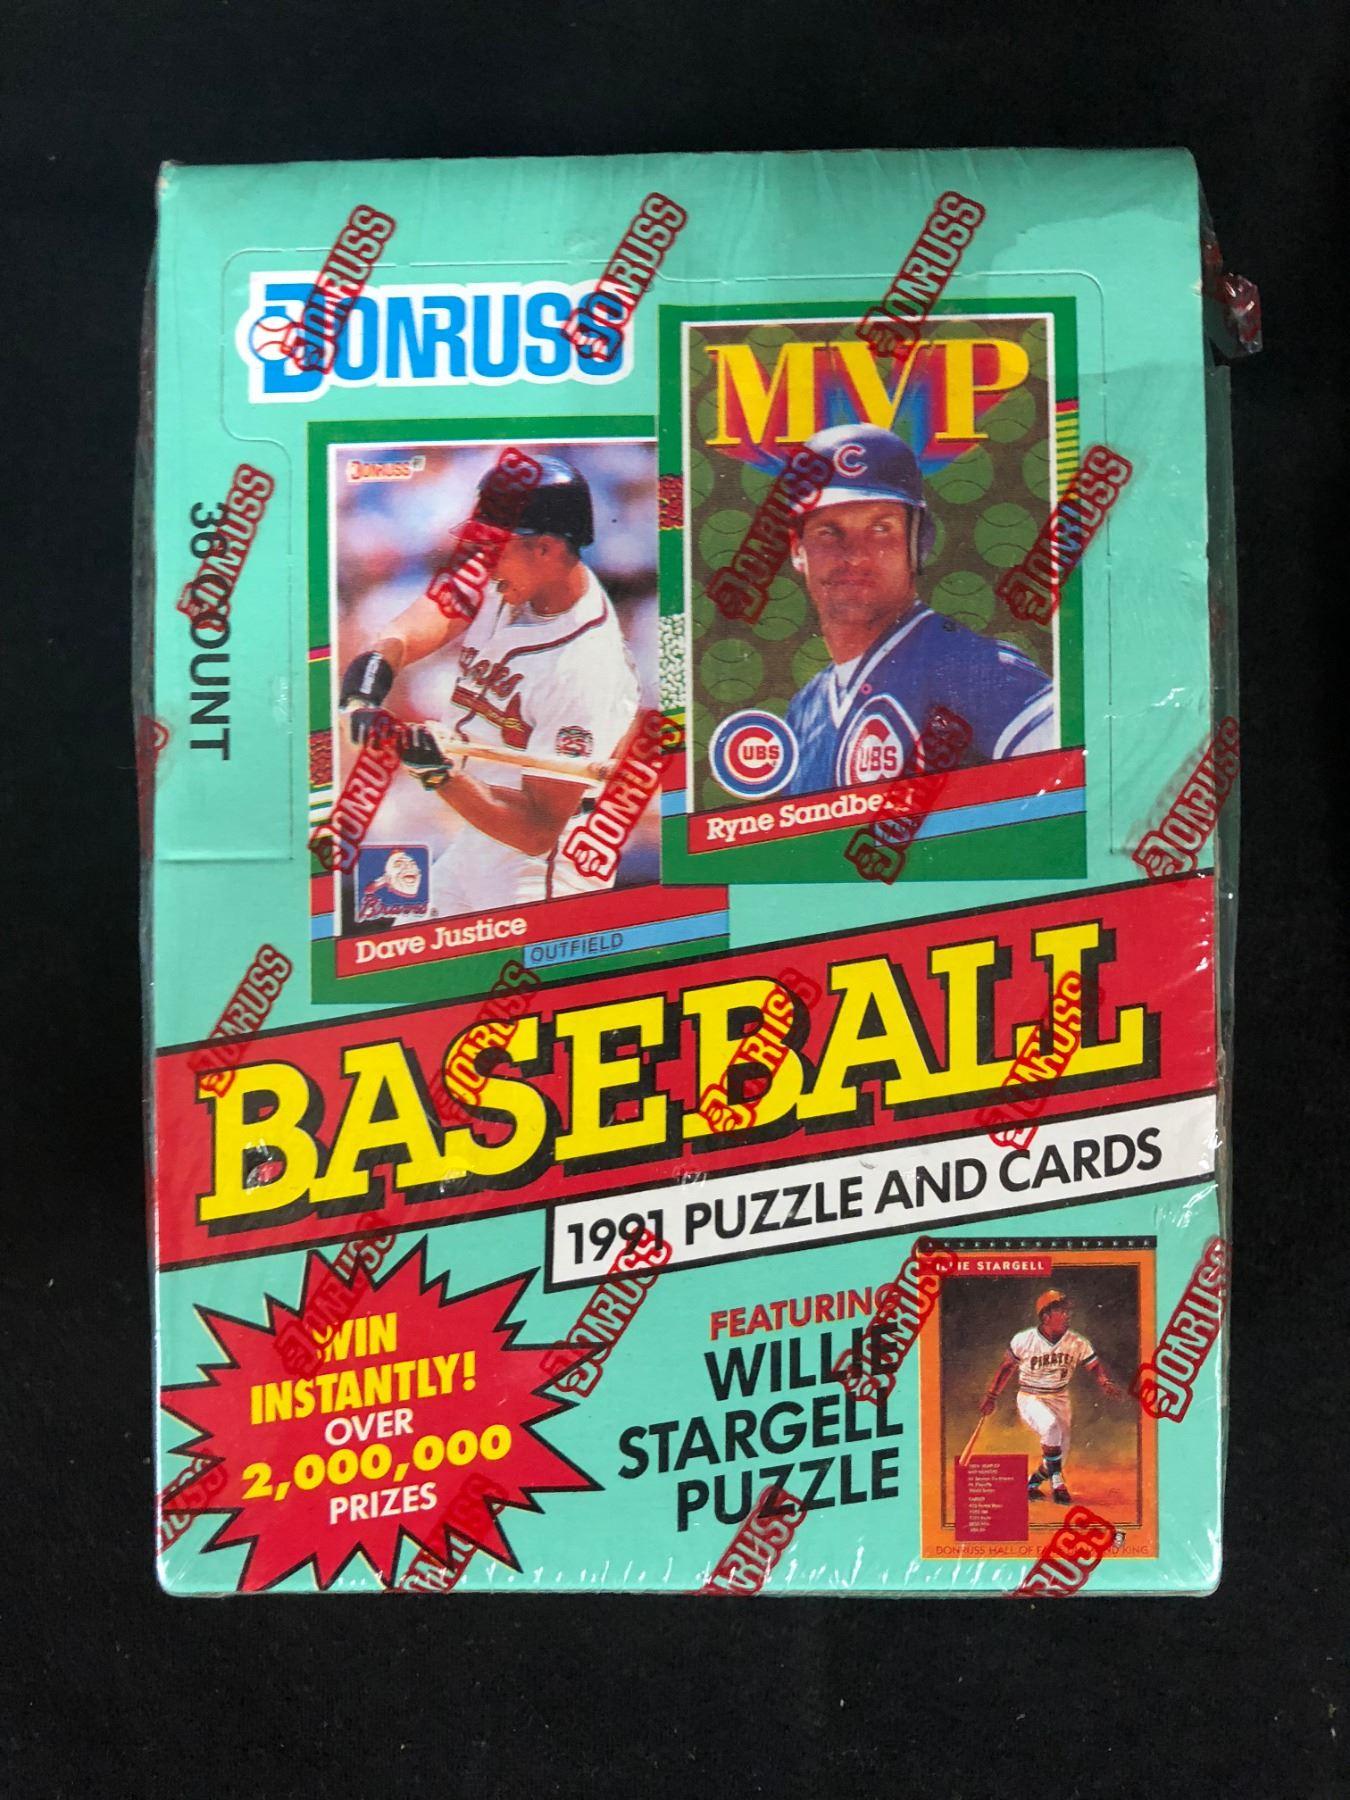 1991 Donruss Baseball Puzzle Cards Box